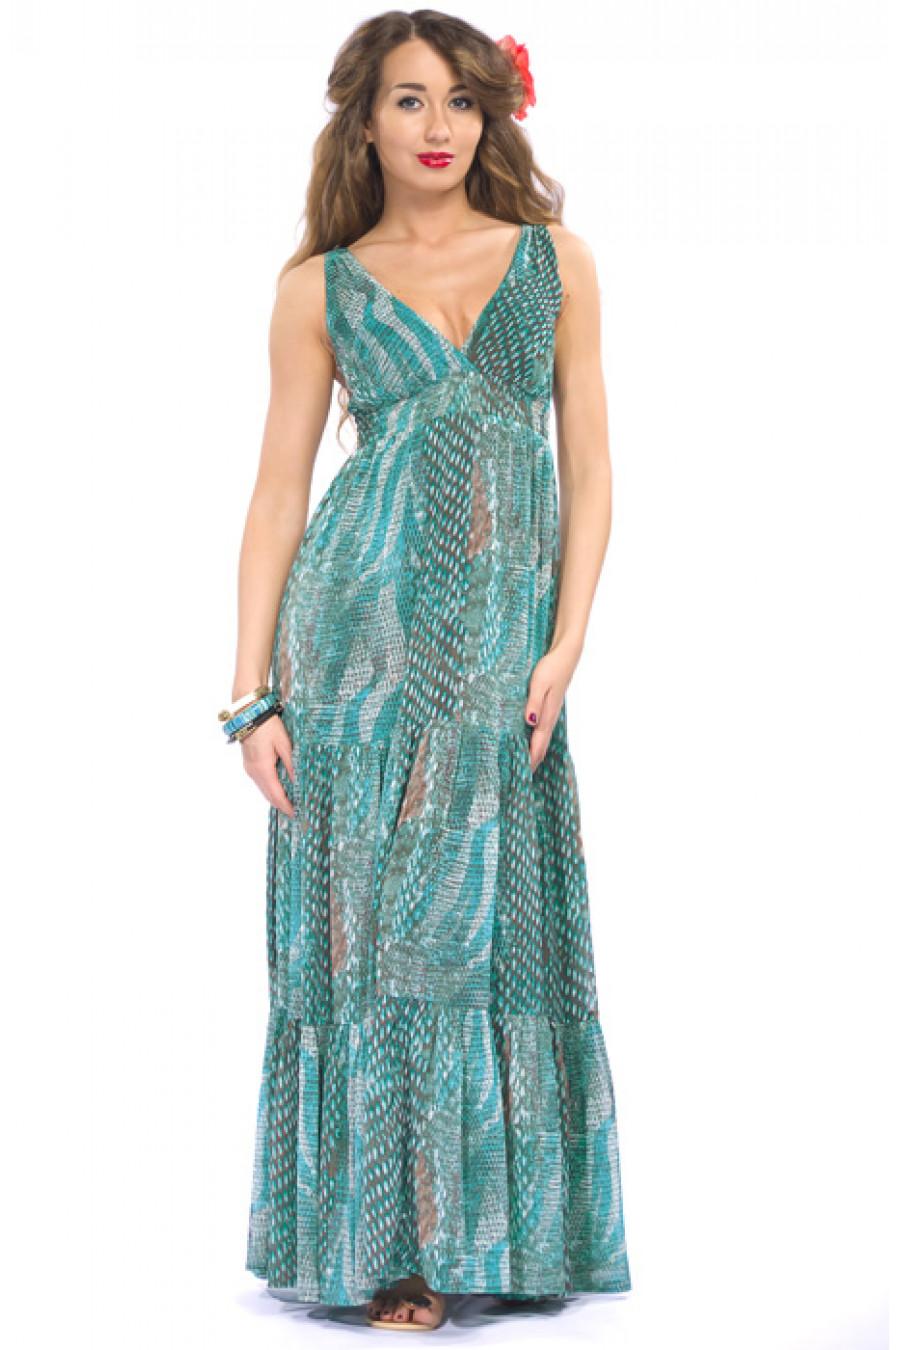 Сарафан из шифона. купить Платья Сарафан из шифона, марка: , онлайн магазин: Lady Shopping, цена: 2700